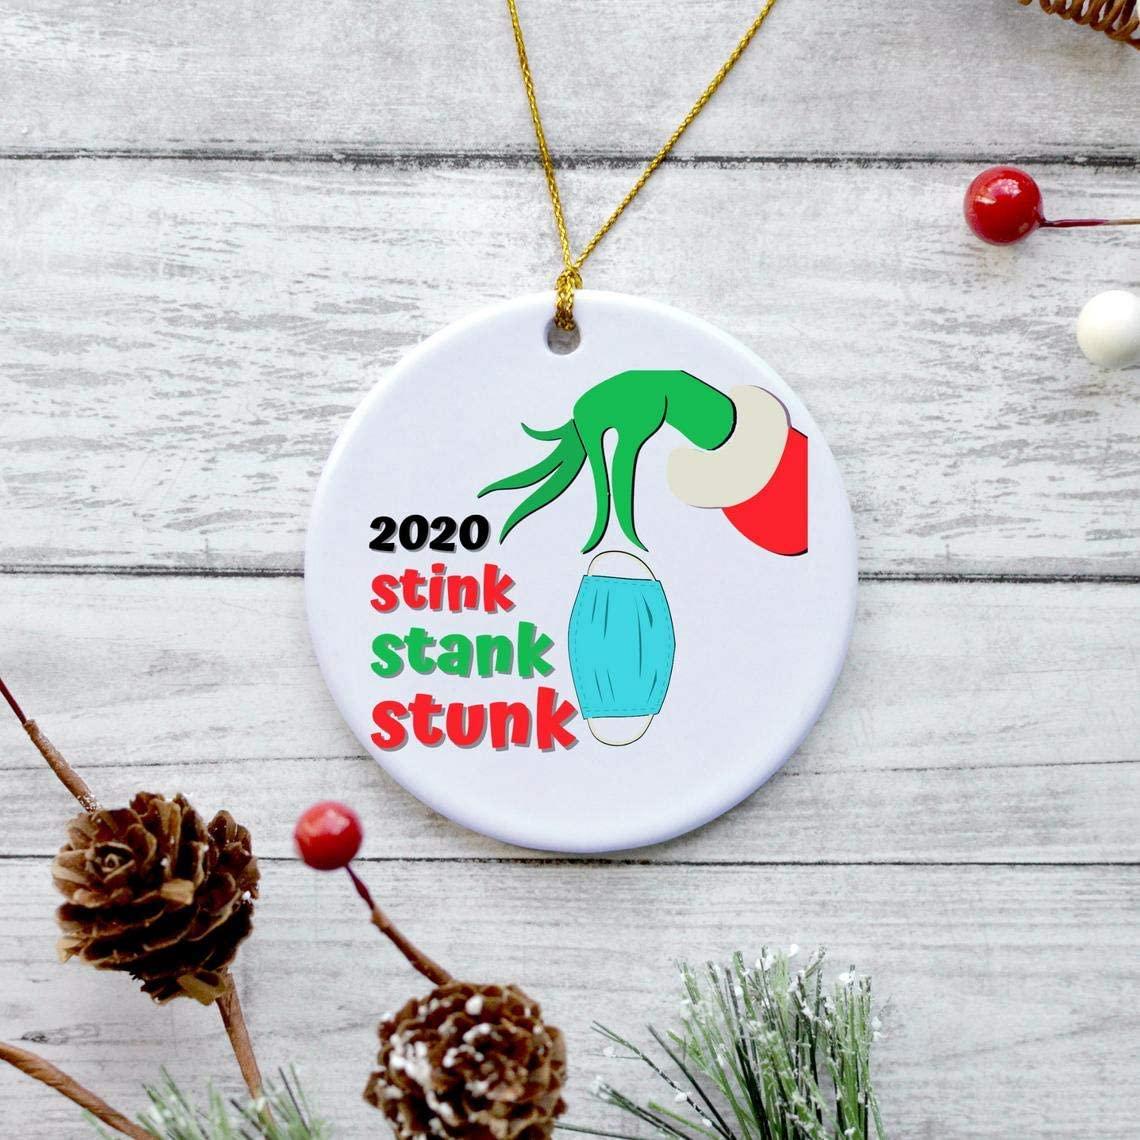 3 Inch Christmas Ornament, Stink Stank Stunk | The Grinch 2020 Christmas Ornament | Personalized Ceramic Ornament | Quarantined 2020 Christmas | Dr. Seuss Mr. Grinch